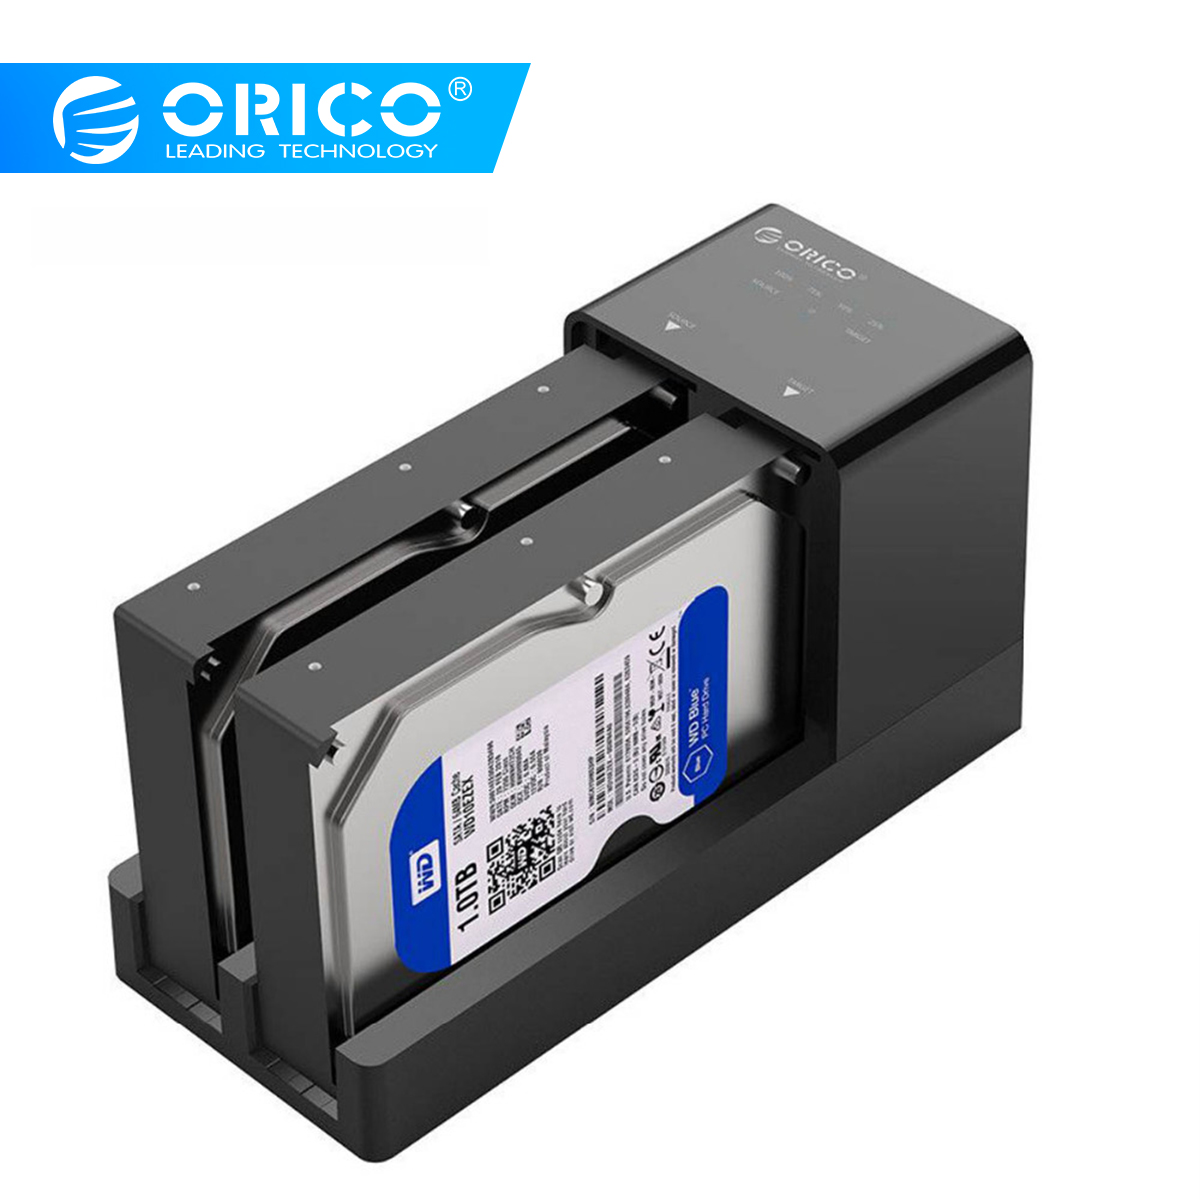 ORICO 2 5 3 5 SATA HDD Enclosure Docking Station Offline Clone Super Speed  USB 3 0 Hard Drive Support 10TB 2 Bay black 6528US3-C